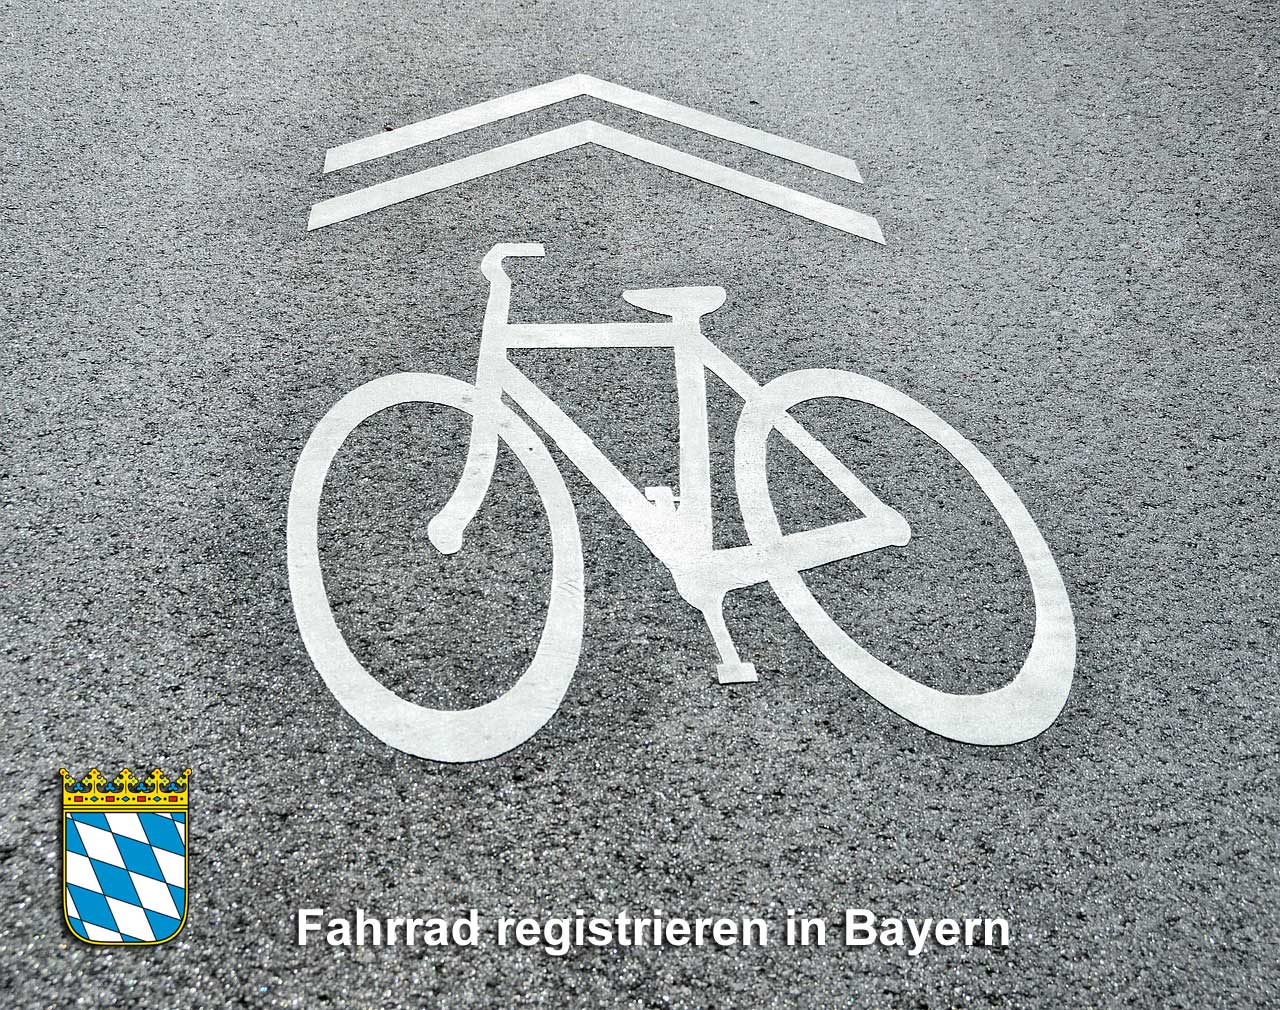 Fahrrad registrieren Bayern - Fahrradpass, Fahrradausweis, Fahrradregister